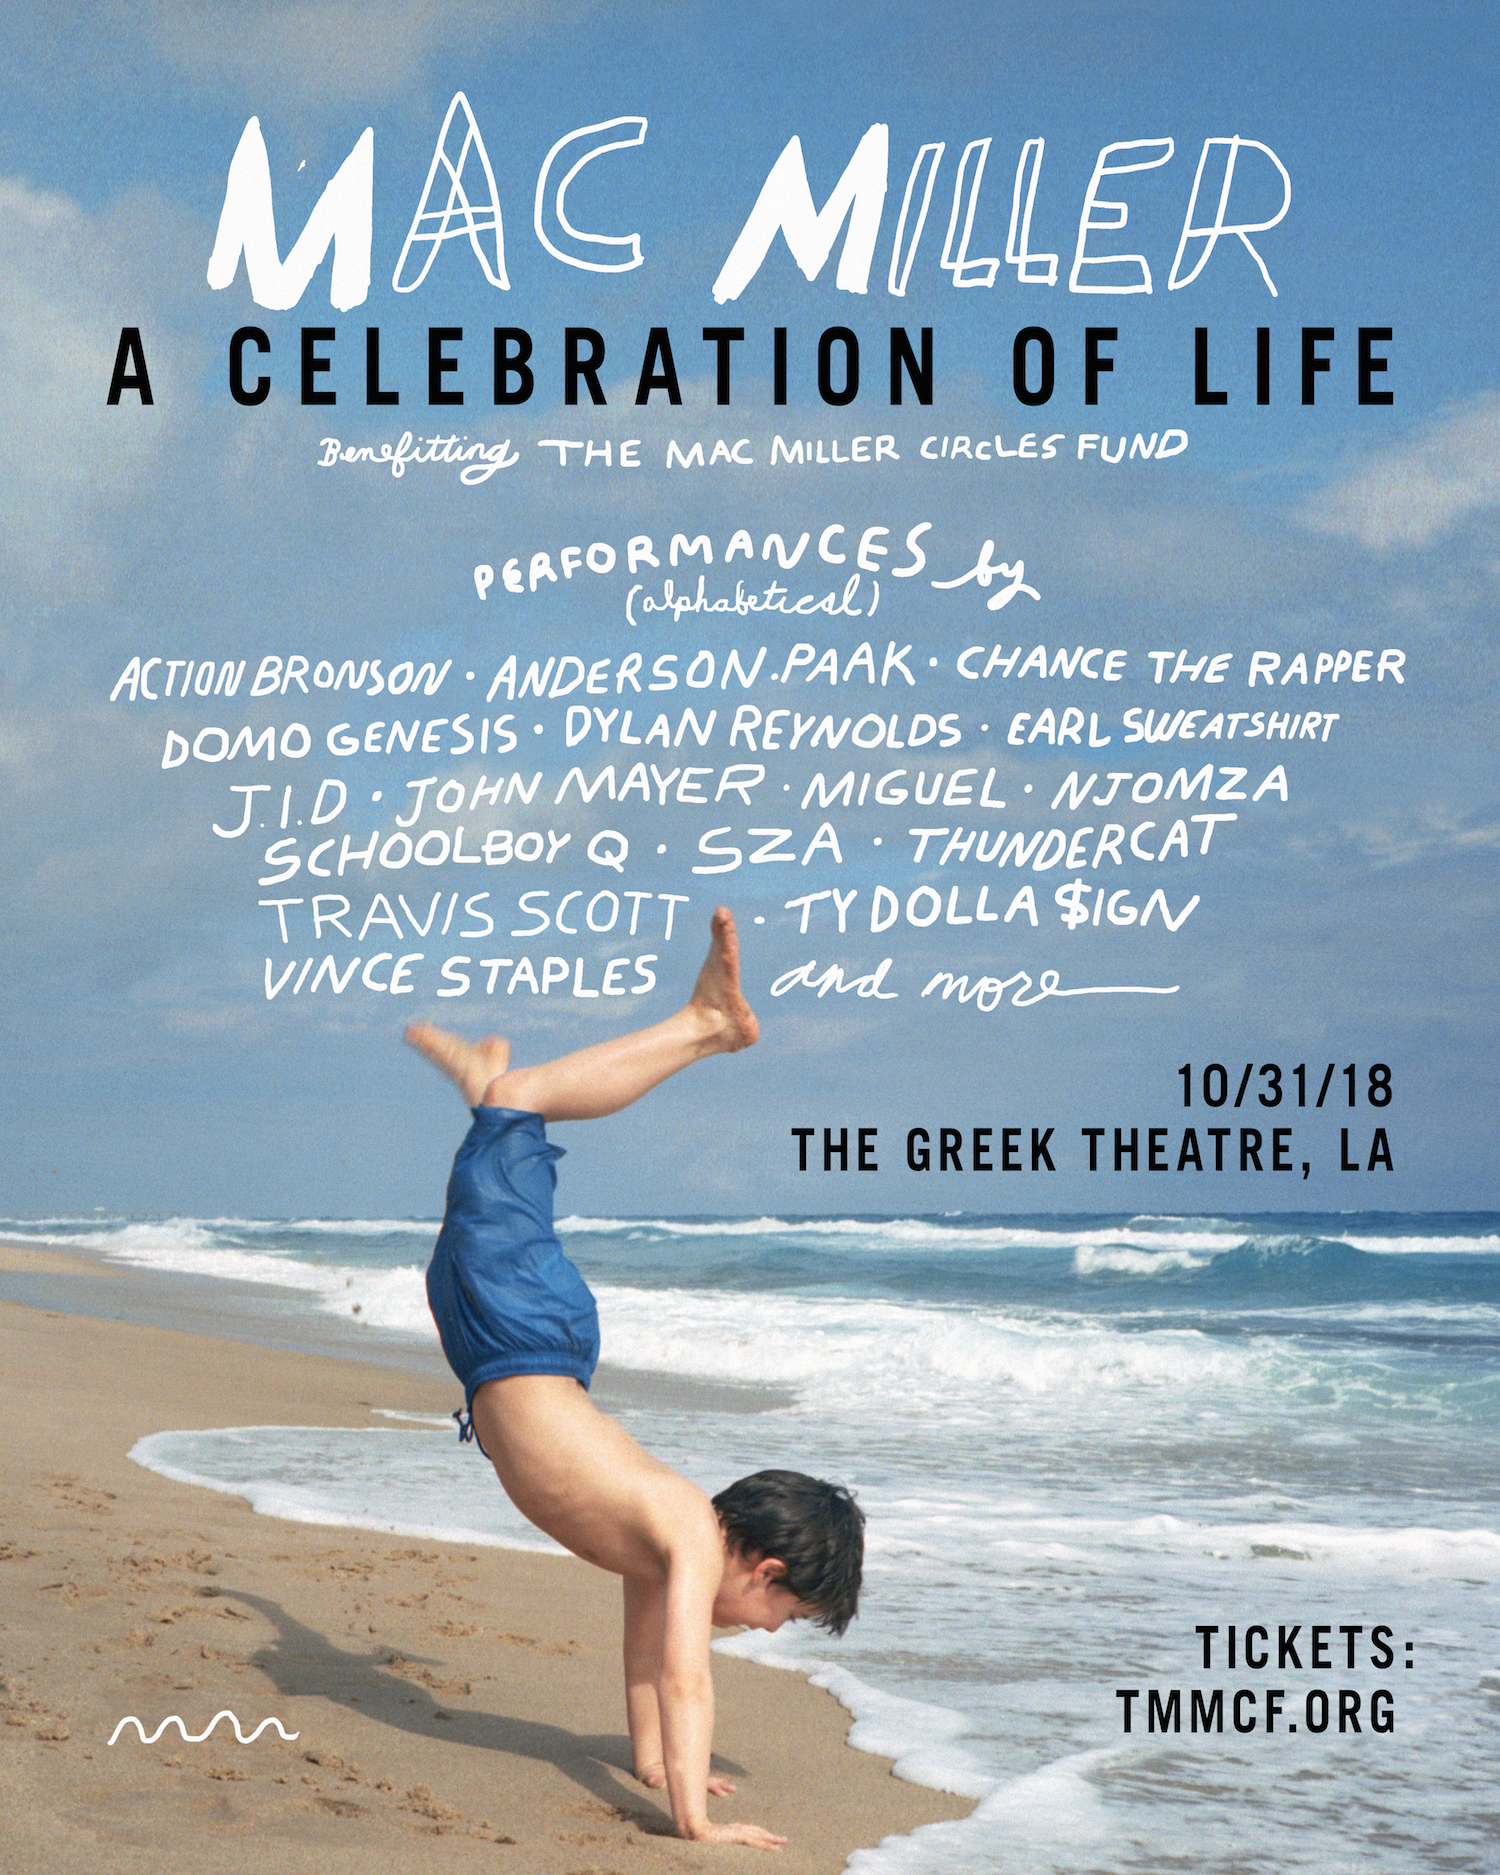 Mac MIller A Celebration of Life Benefit Concert Lineup Poster